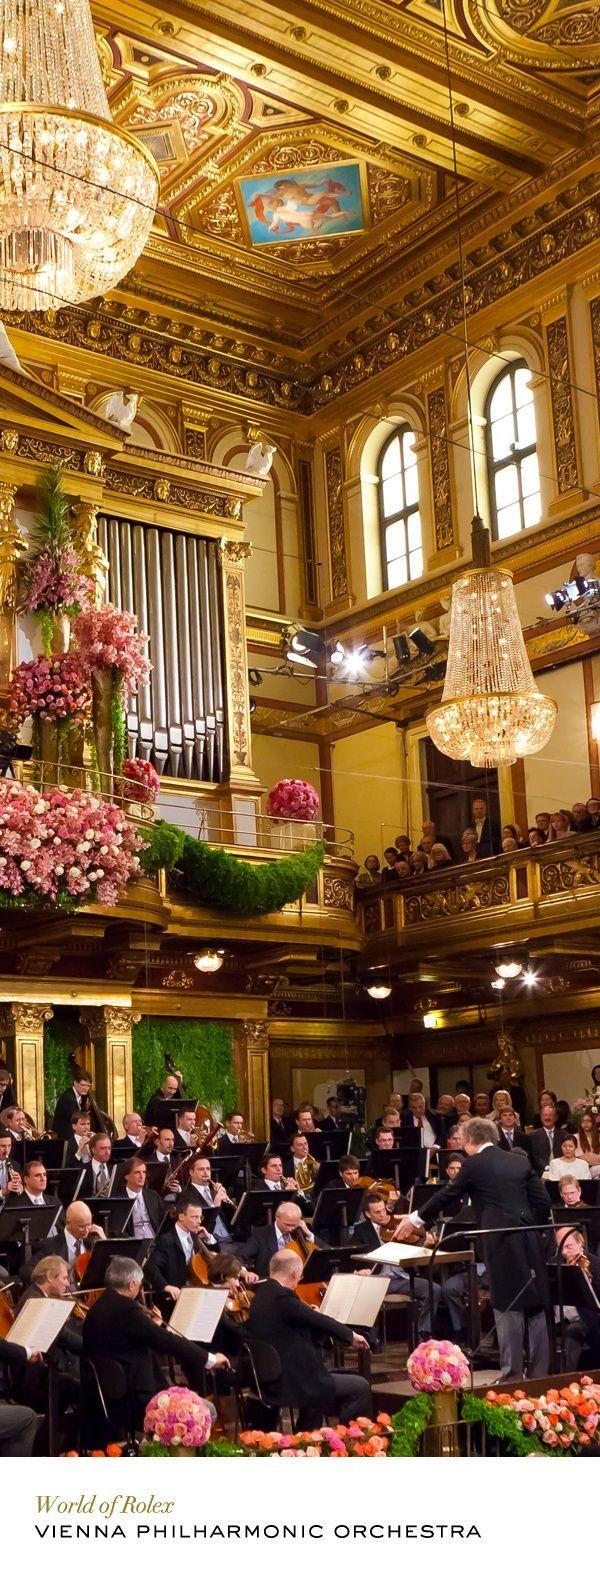 Vienna Philharmonic Orchestra, New Year's Concert, from Vienna, Austria via